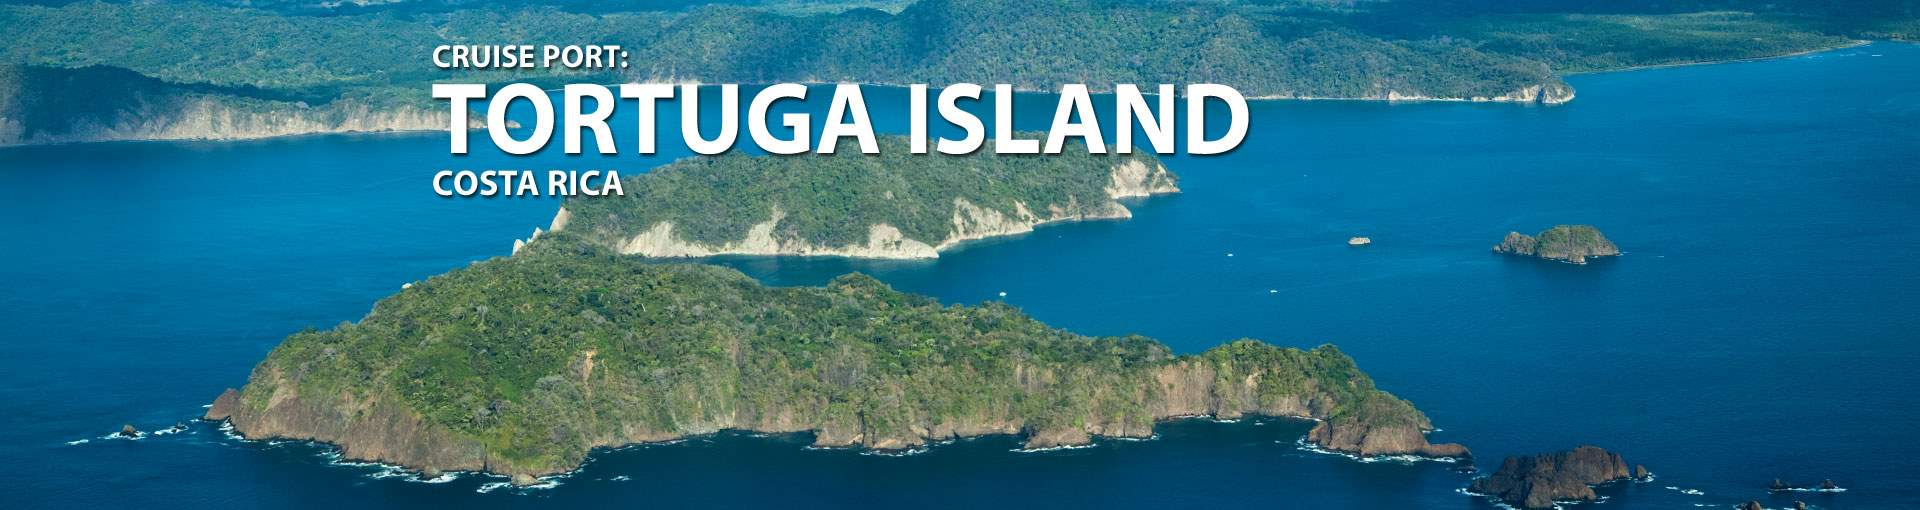 Cruises to Tortuga Island, Costa Rica